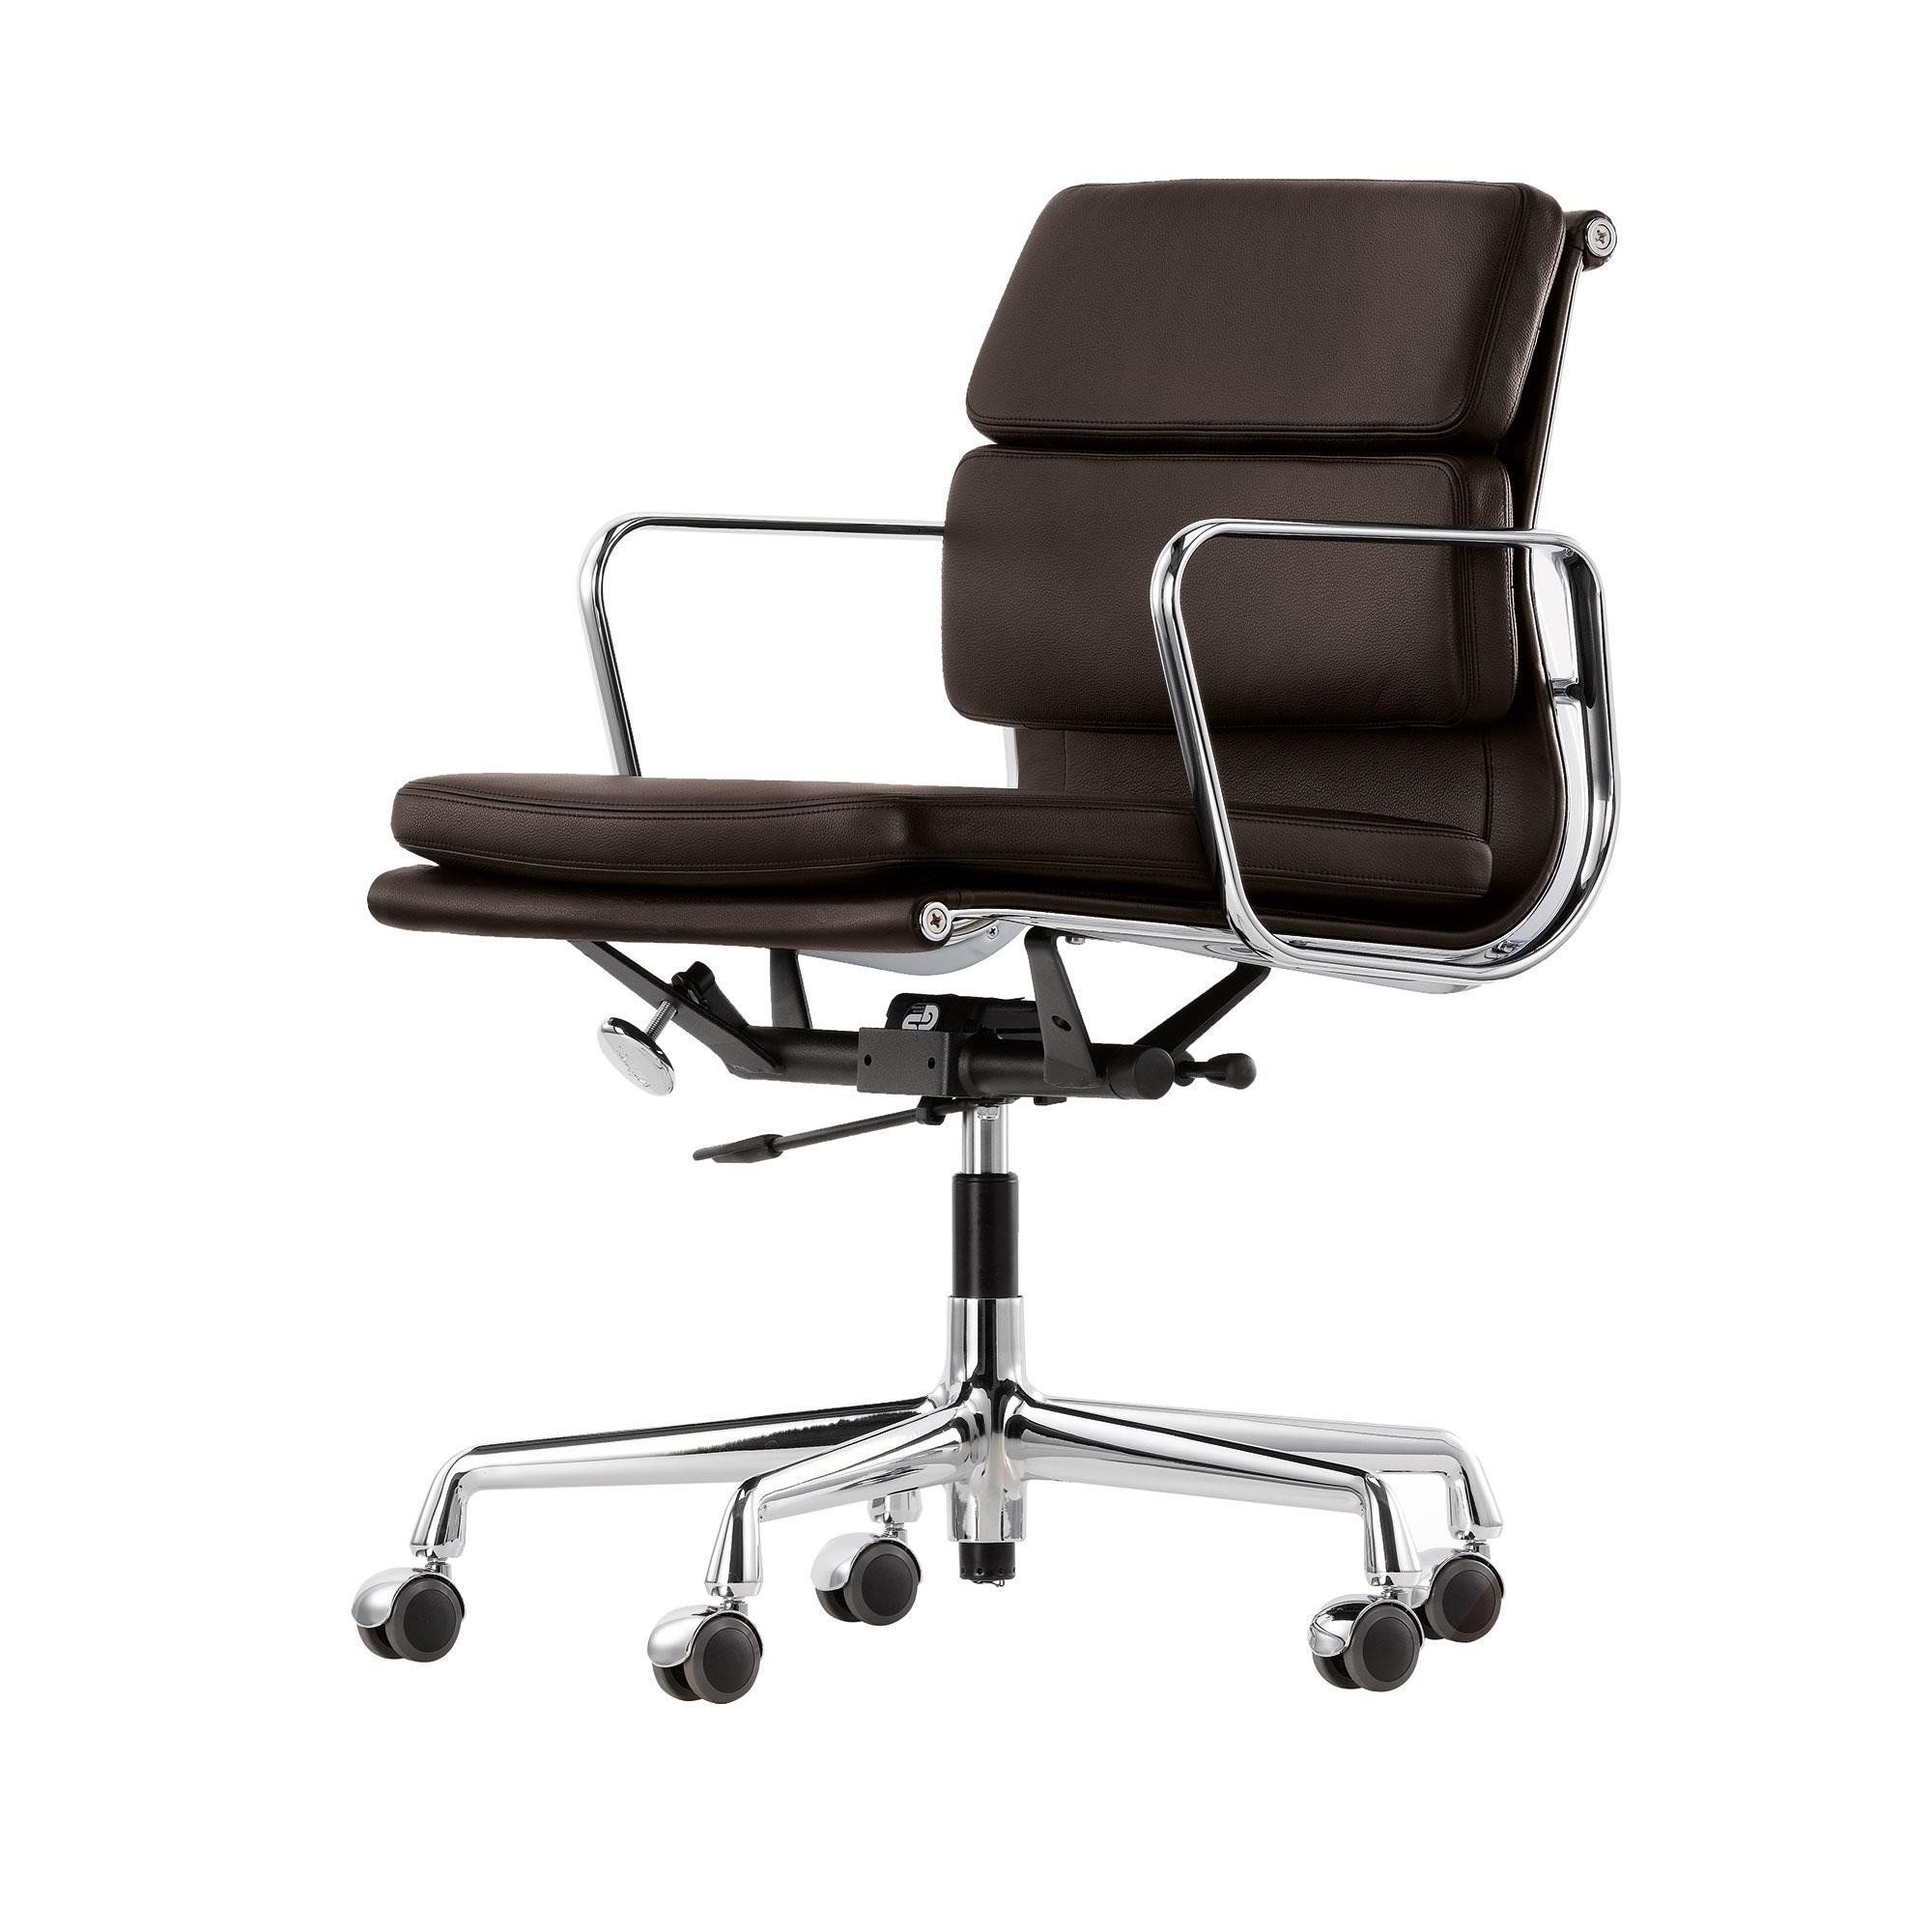 Vitra Soft Pad Chair Ea 217 Chrome Brown Leather 68 Chocolate Wxhxd